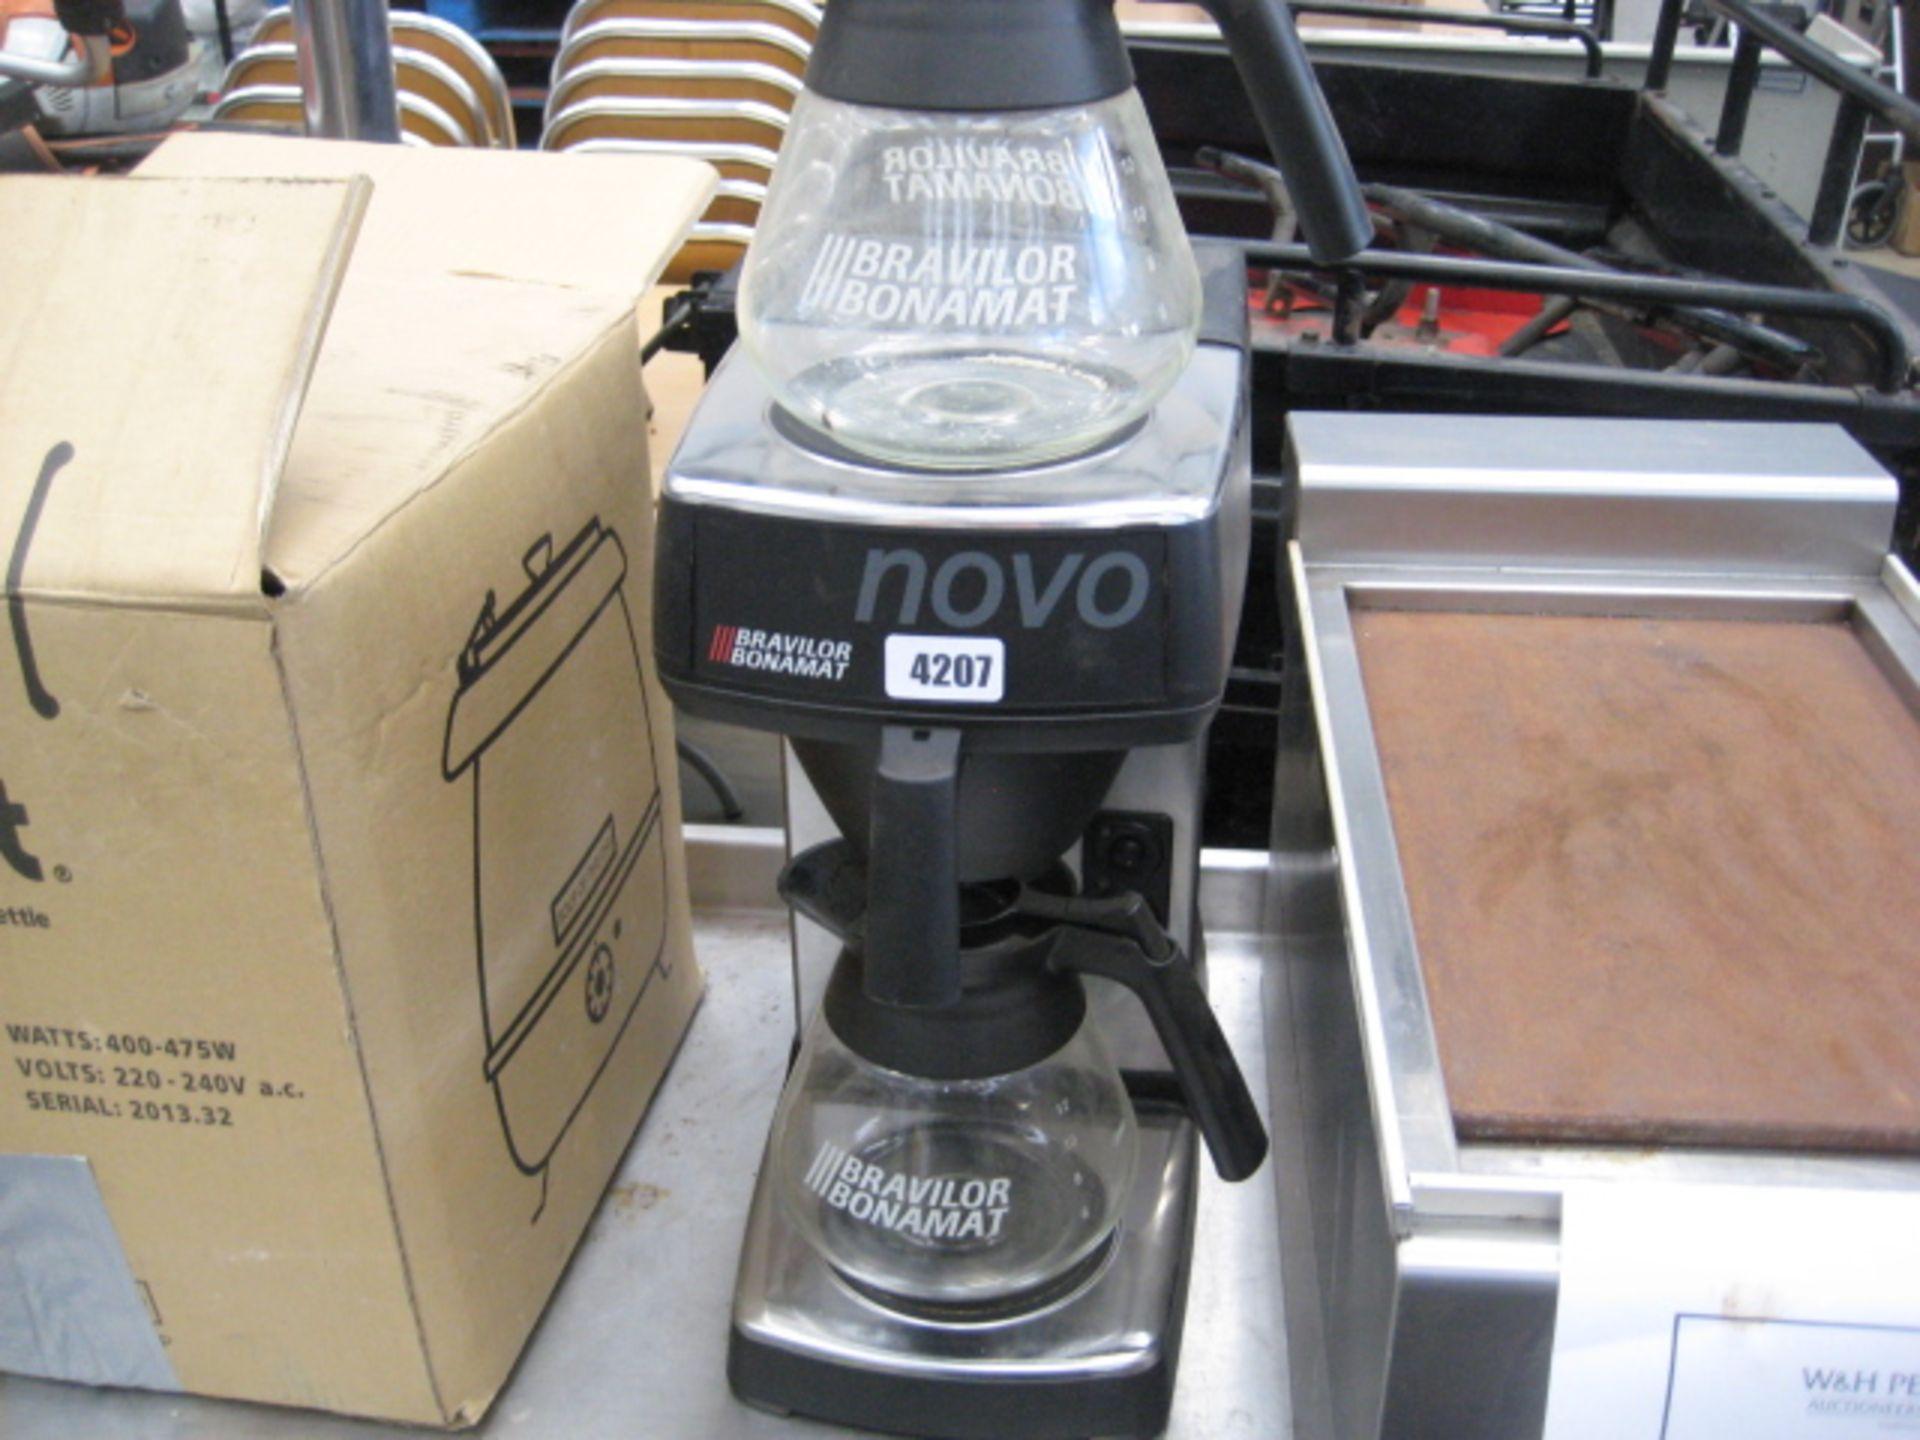 Lot 4207 - Bonamat Novo coffee percolator with 2 jugs